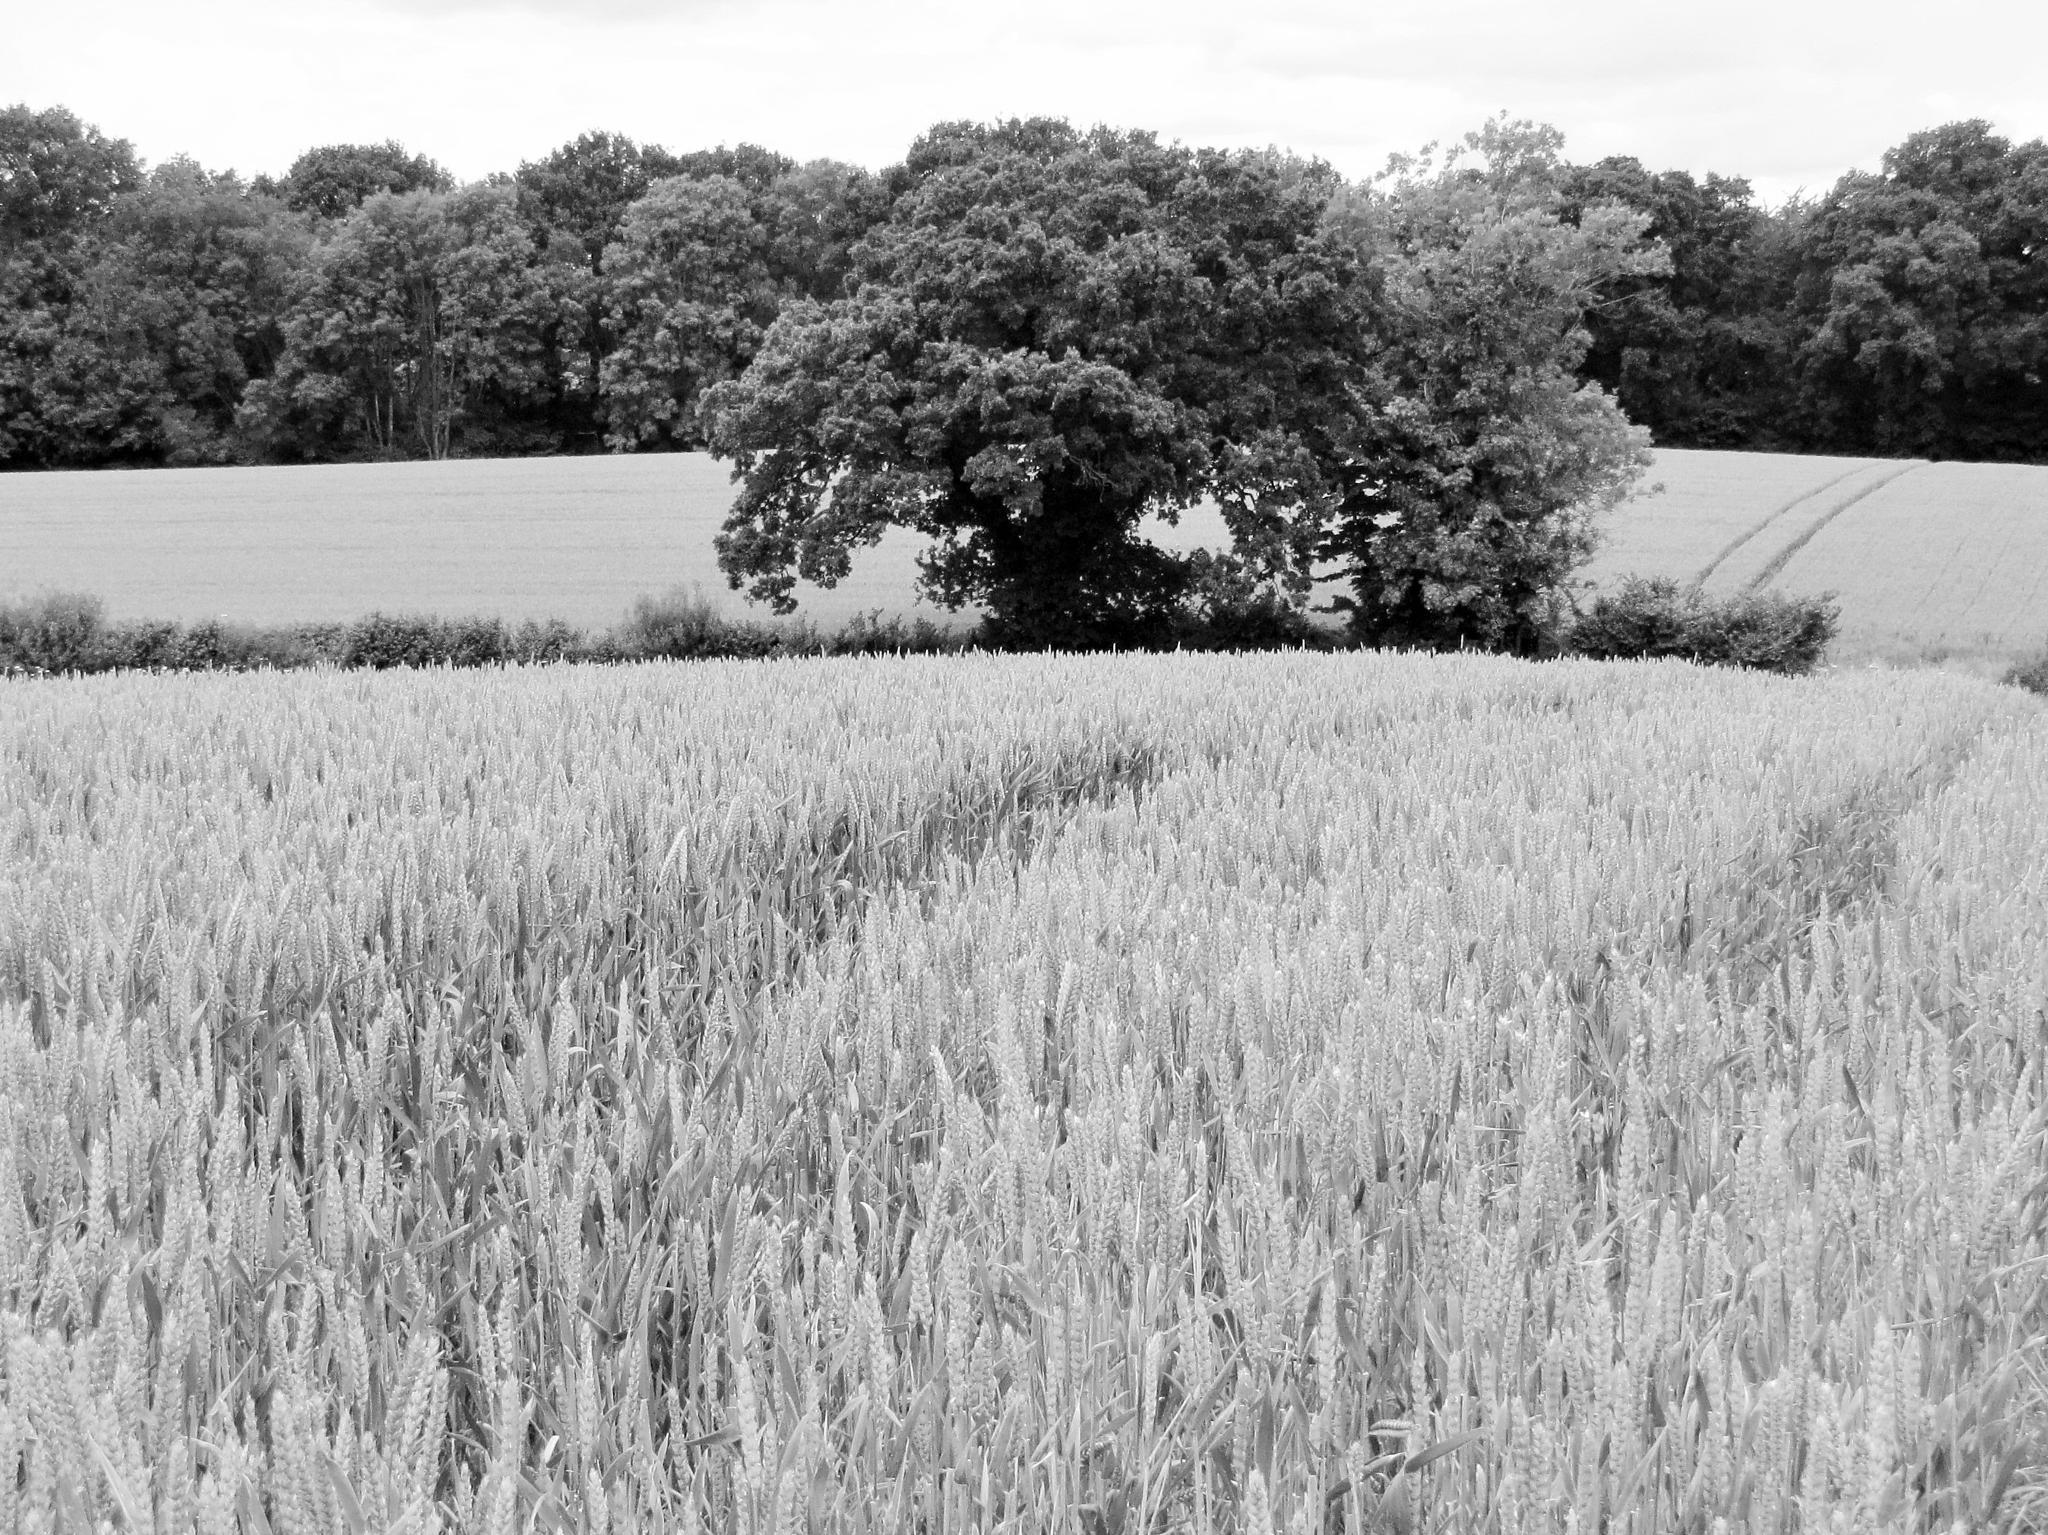 Wheatfields & Trees by geoff richards